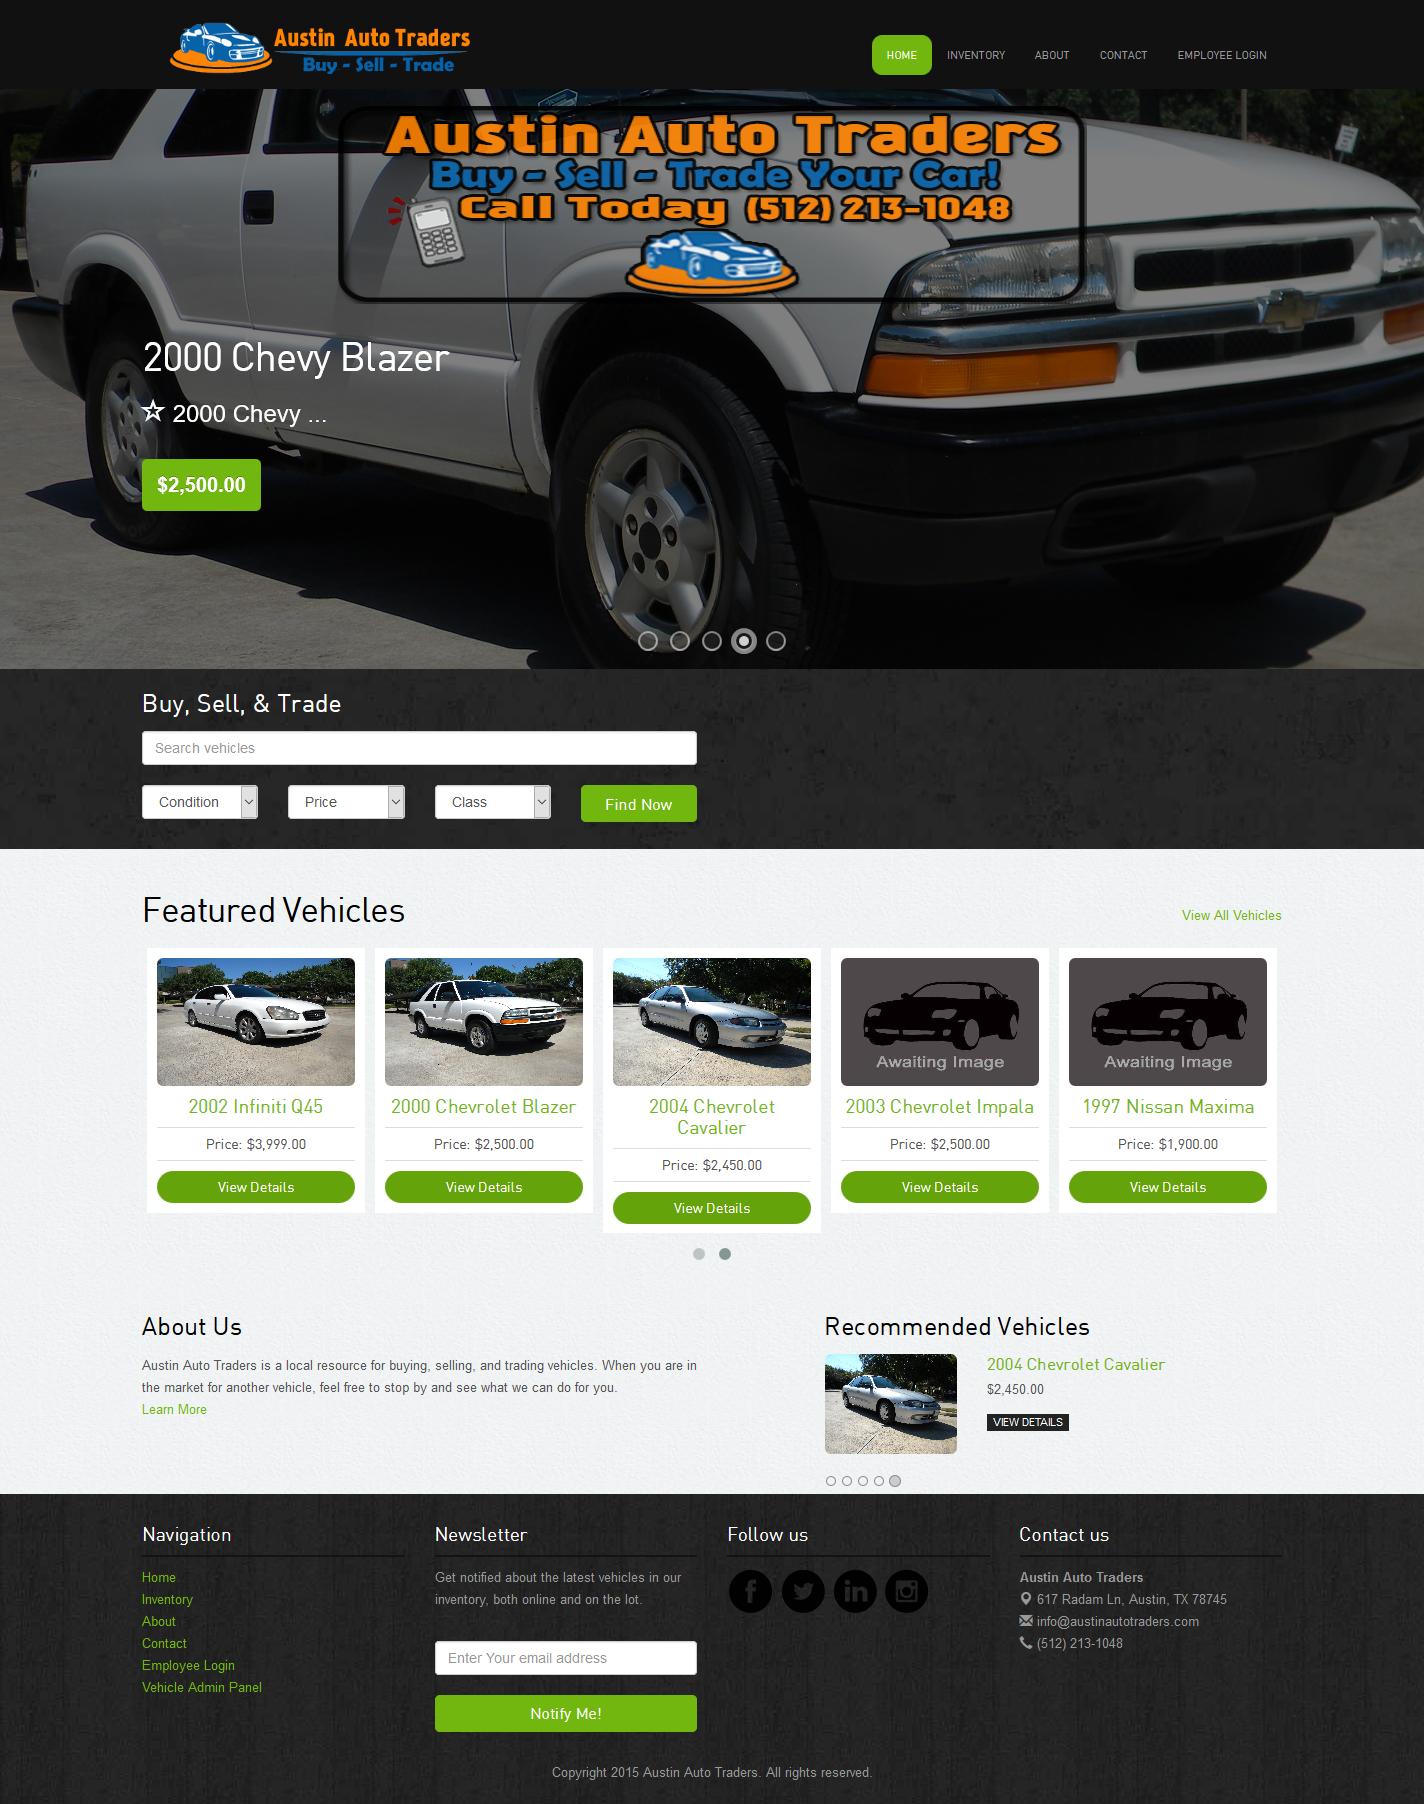 Austin Auto Traders